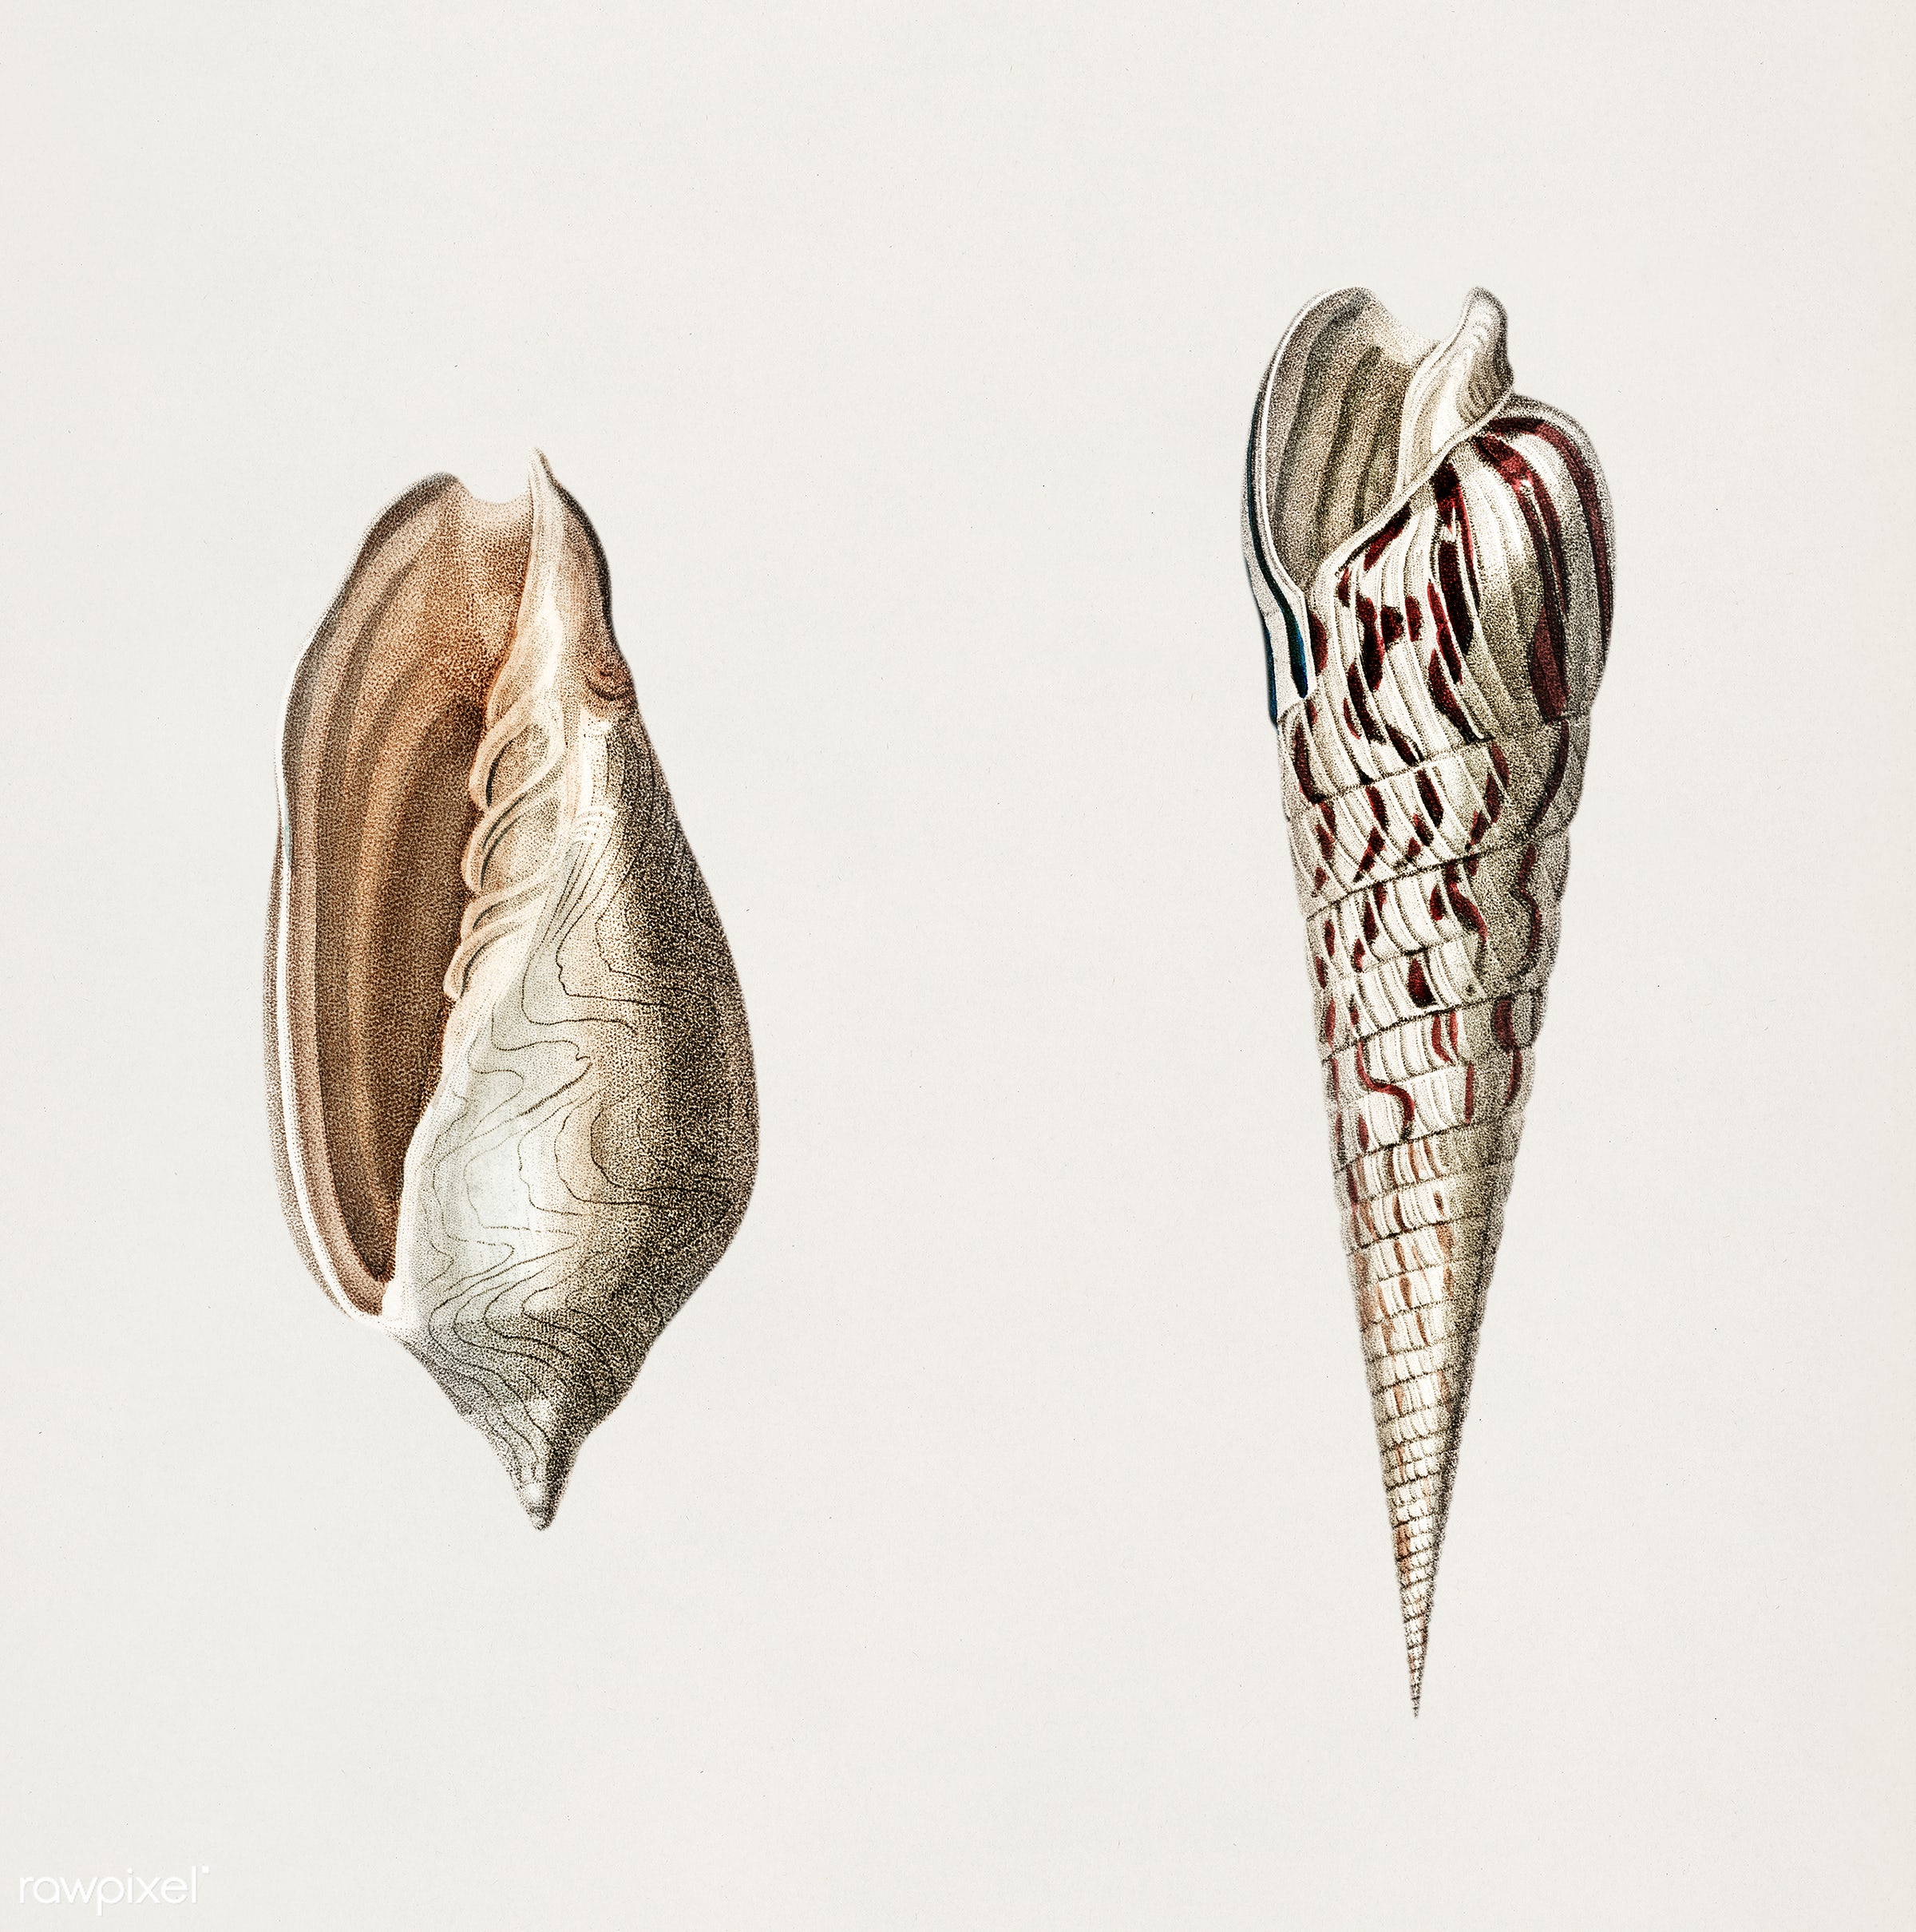 Wavy Volute (Voluta undulata) and Zebra Auger (Terebra strigata) illustrated by Charles Dessalines D' Orbigny (1806-1876...